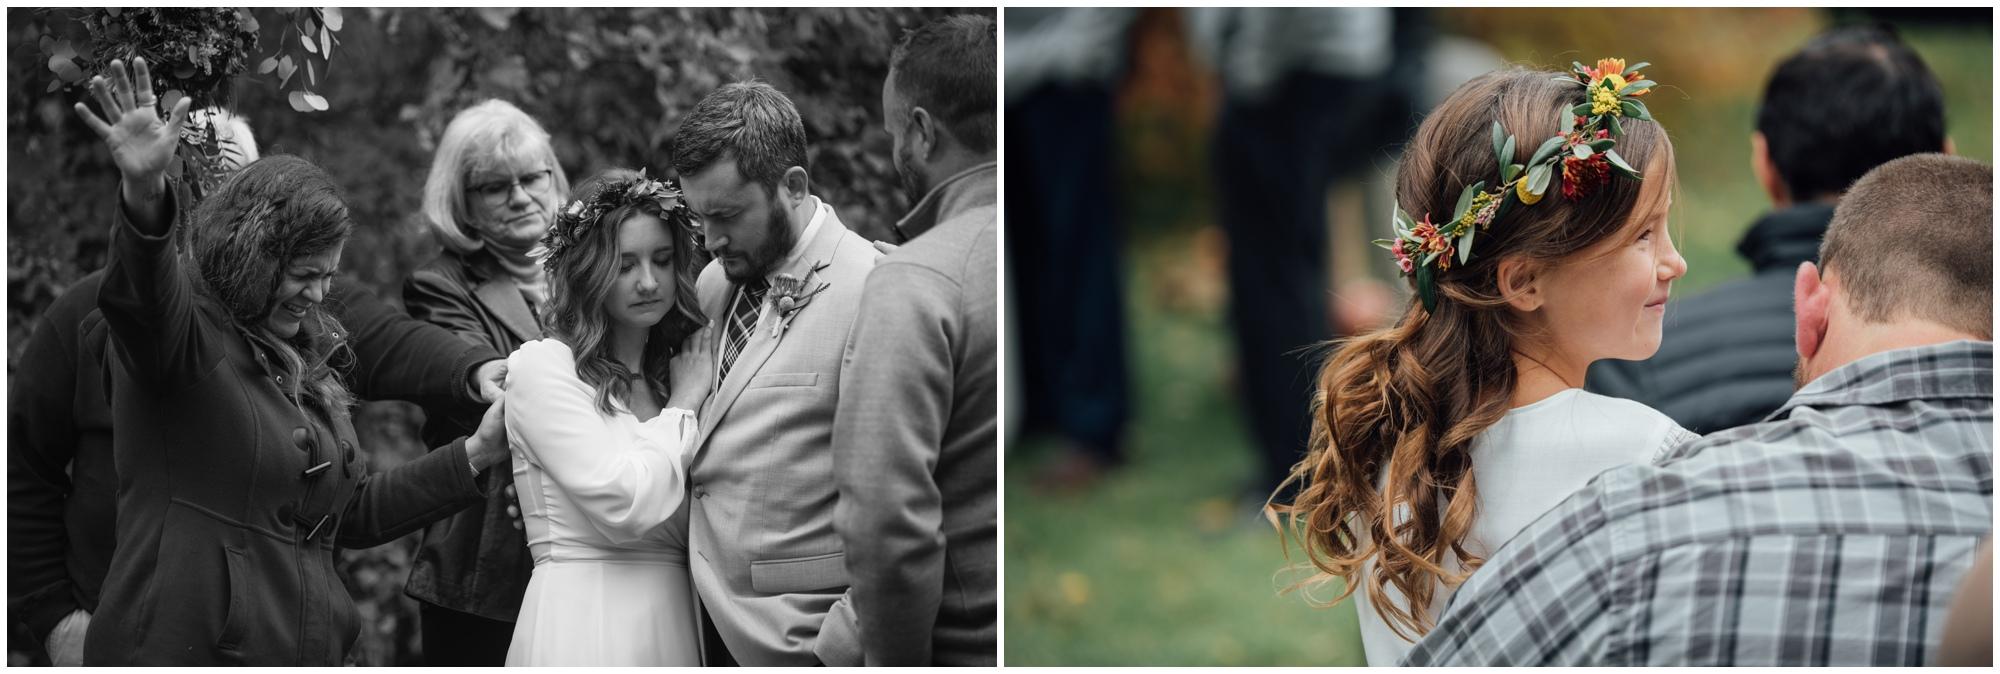 minneapolis-wedding-photography_0044.jpg